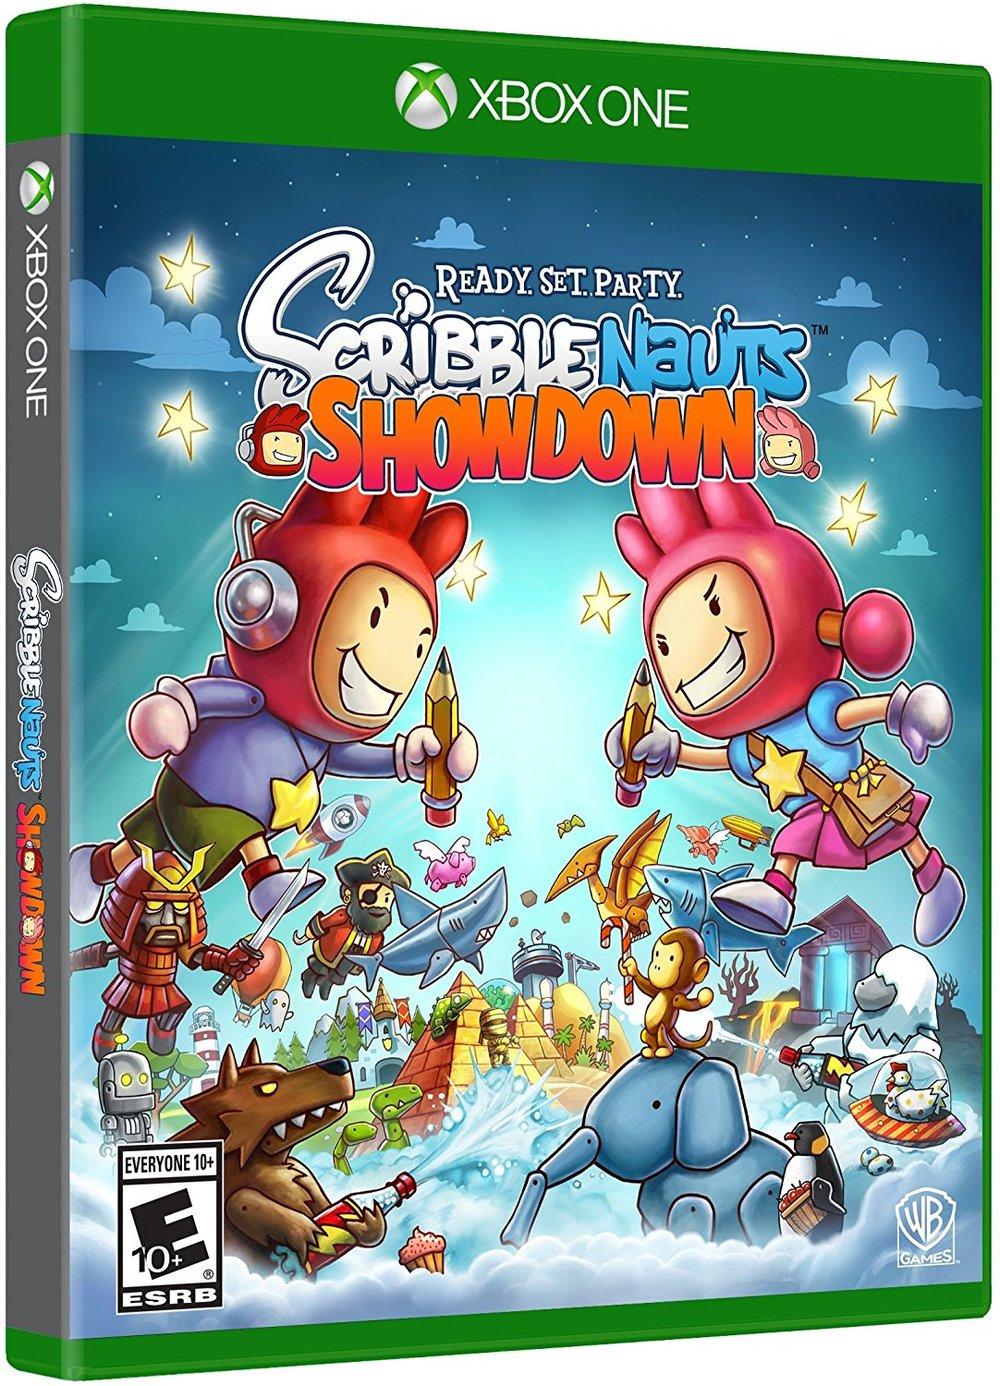 Scribblenauts Showdown - Xbox One - - $19.99 - $20 off or 50%